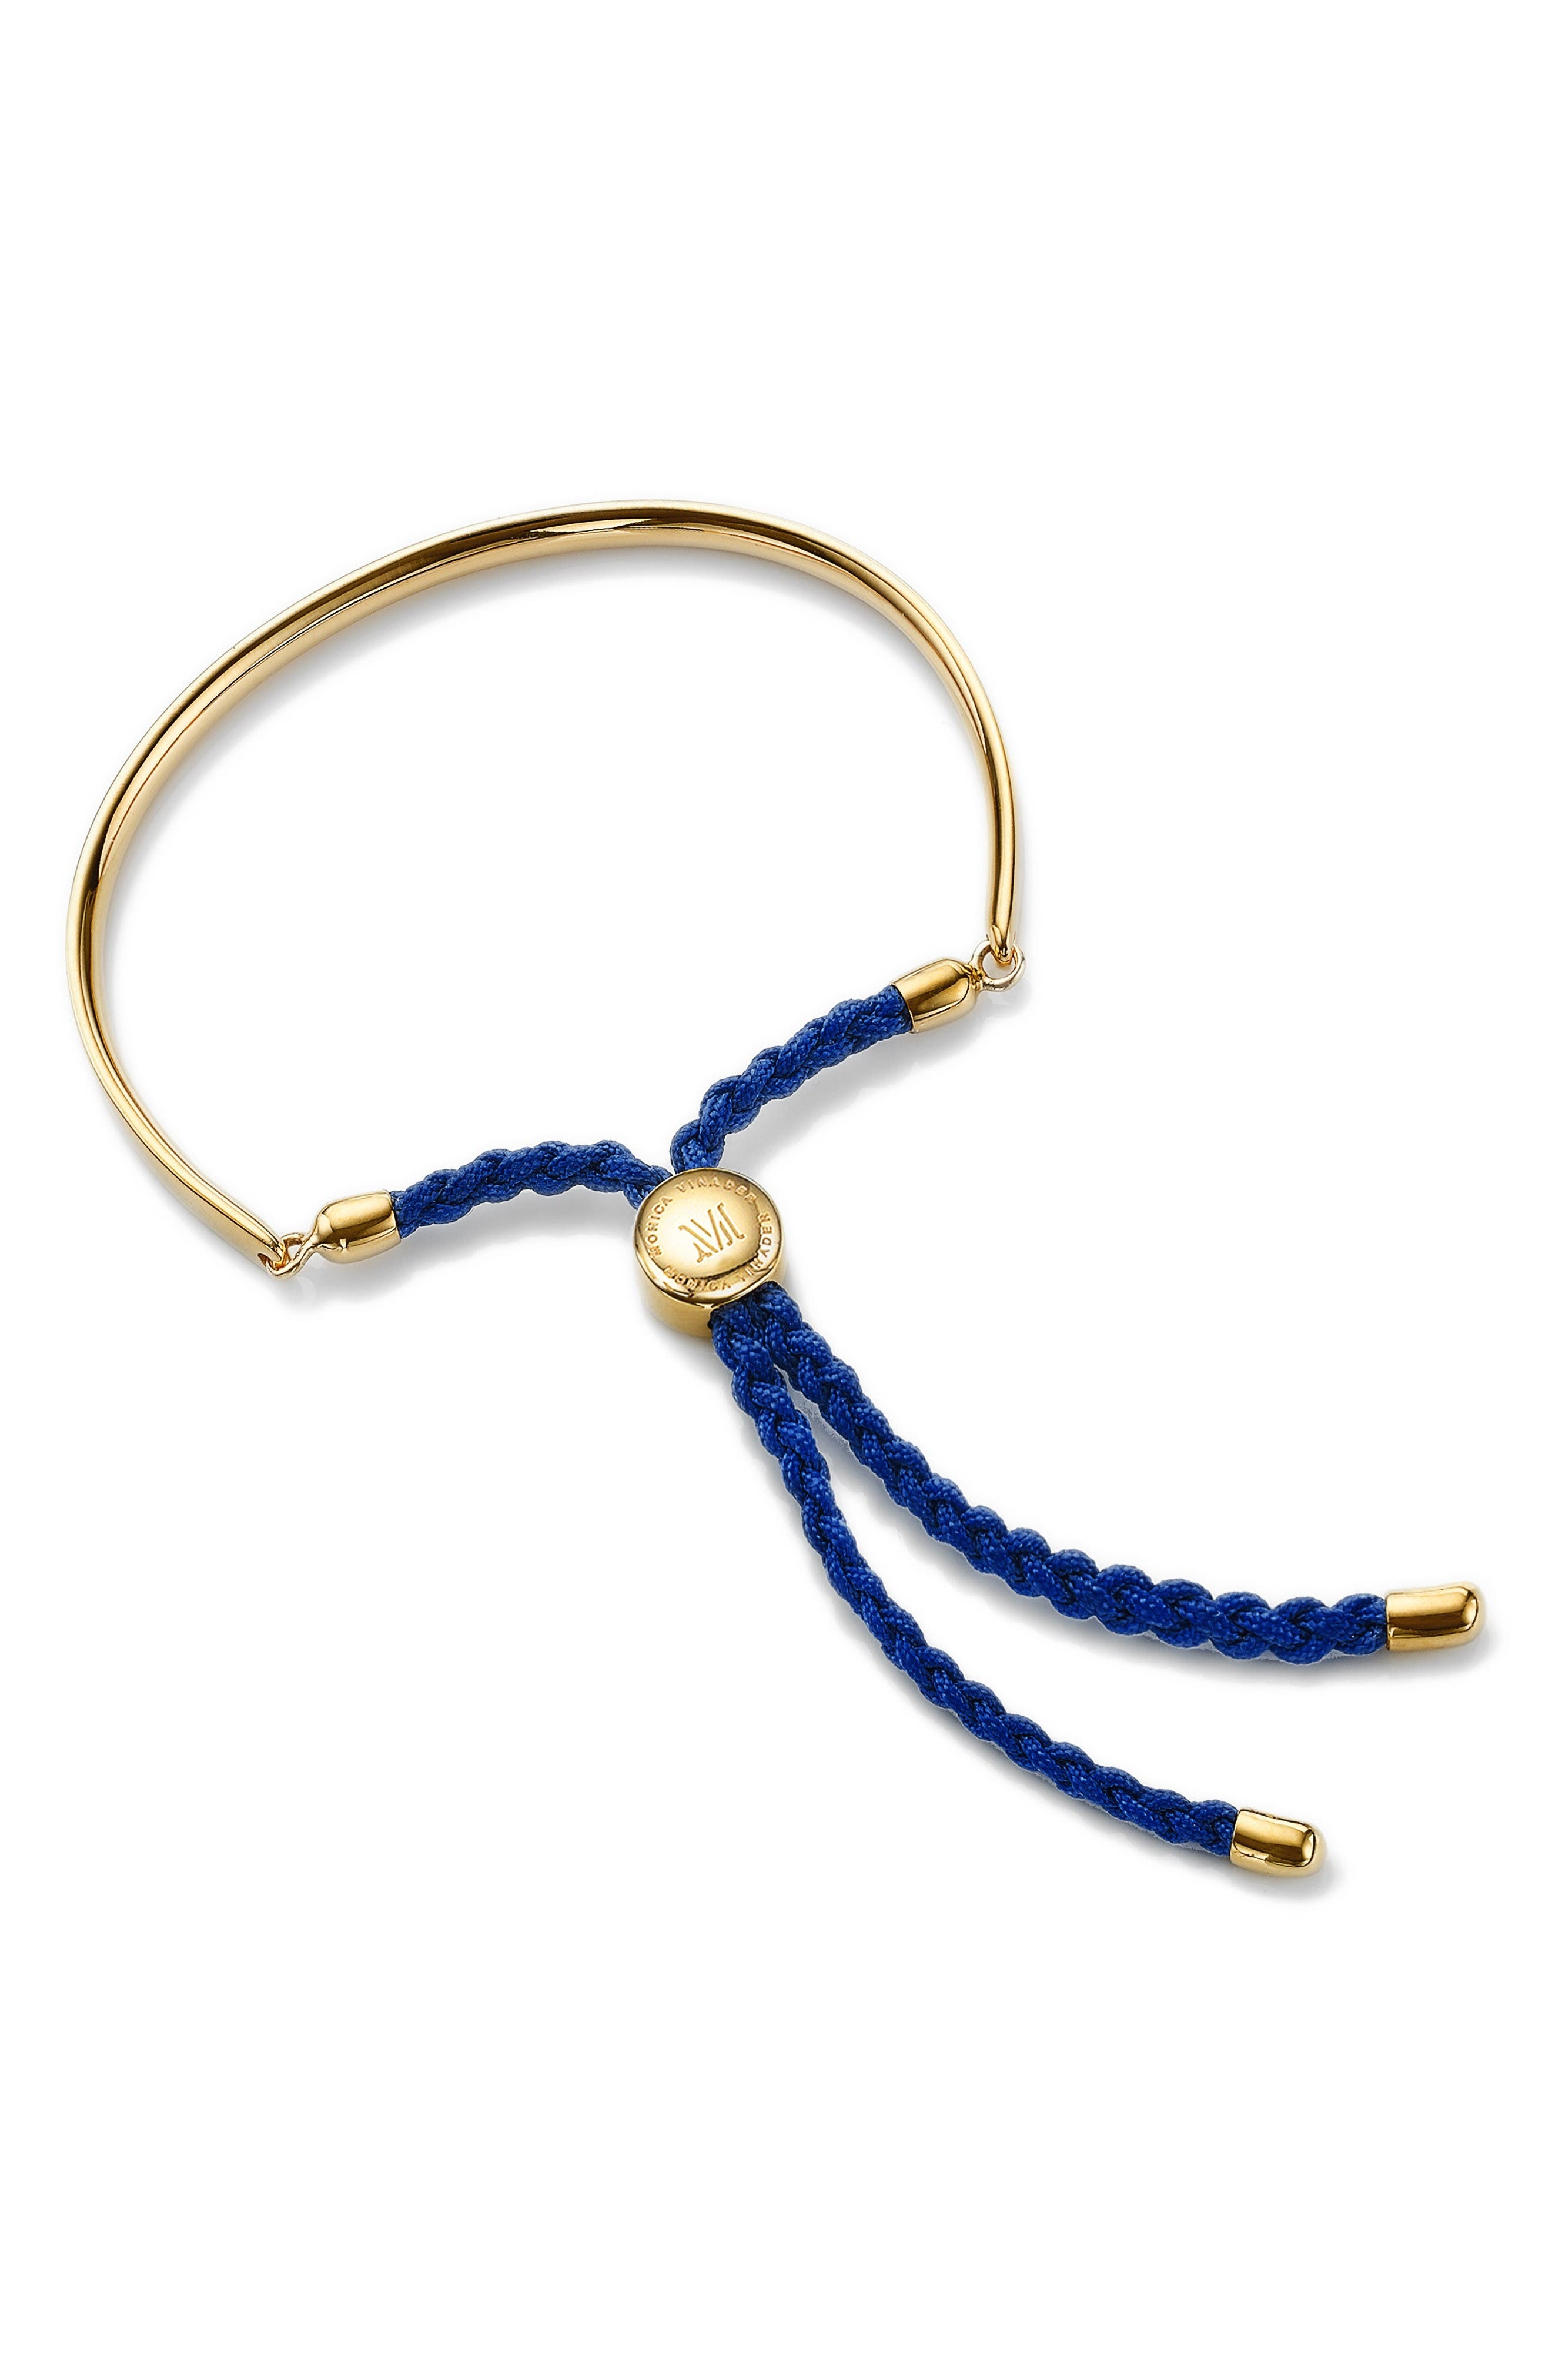 MONICA VINADER 'Fiji' Friendship Bracelet